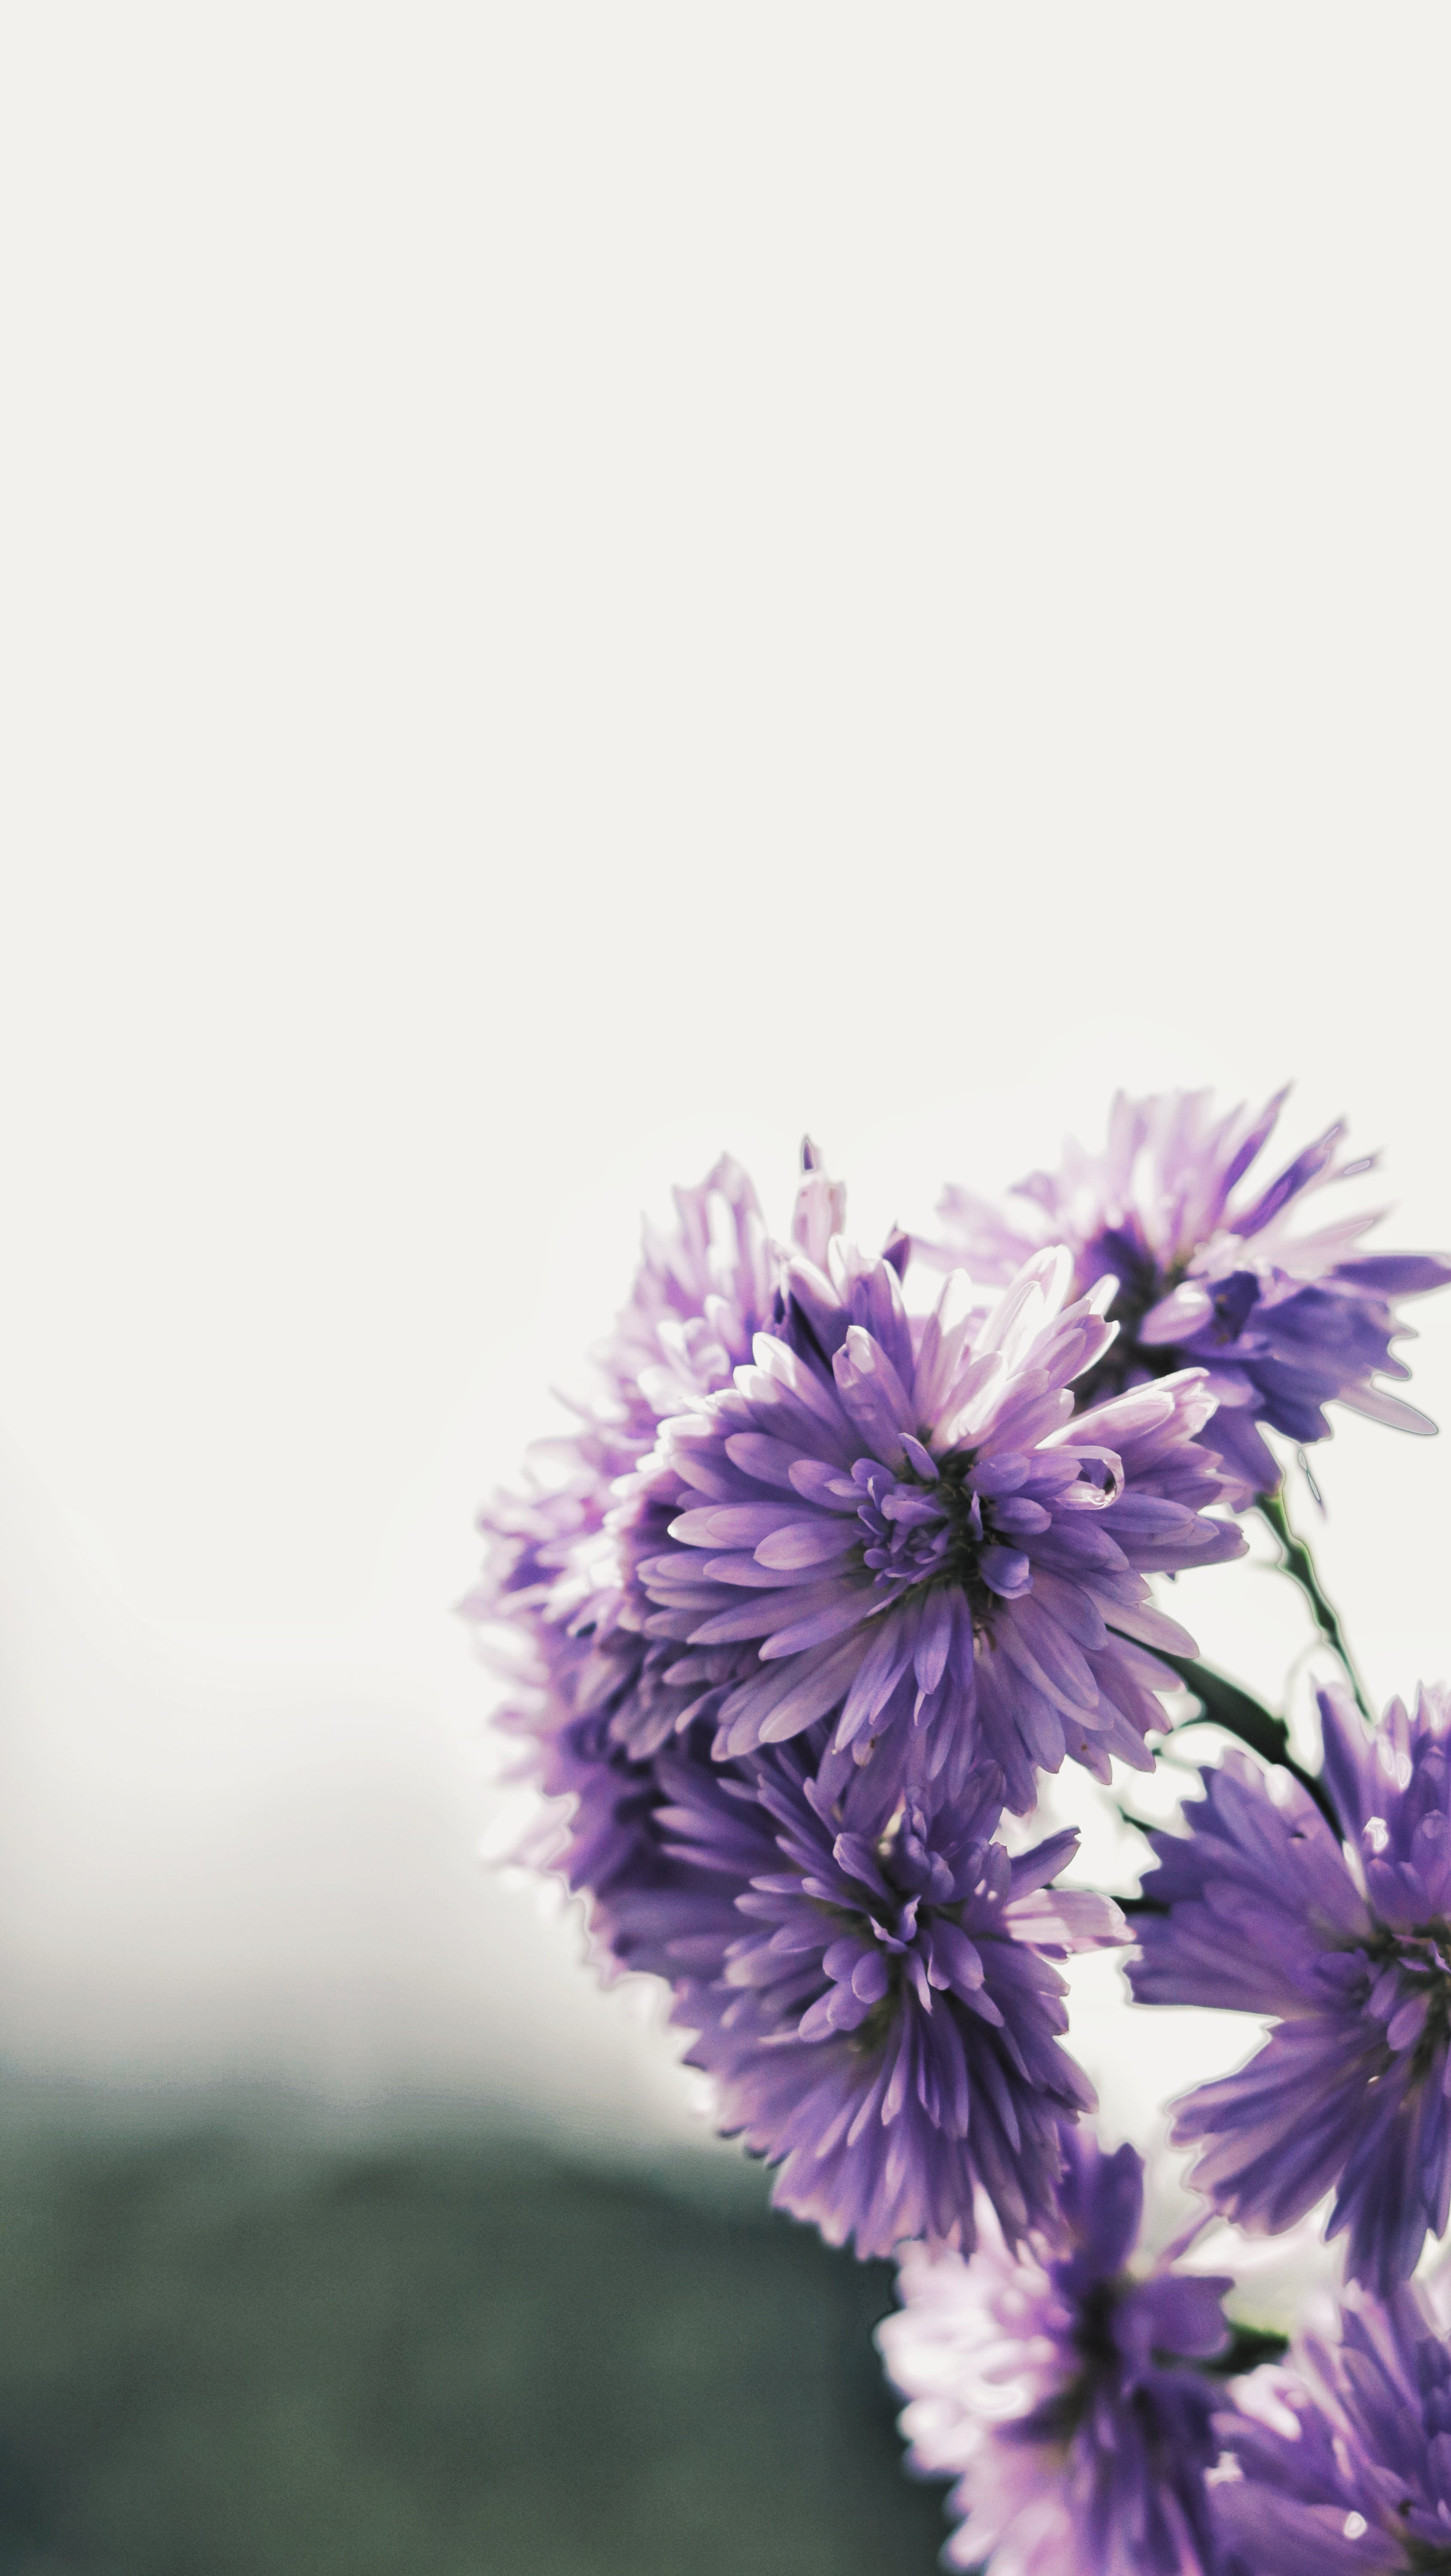 Free stock photo of beautiful, beautiful flowers, bloom, bright